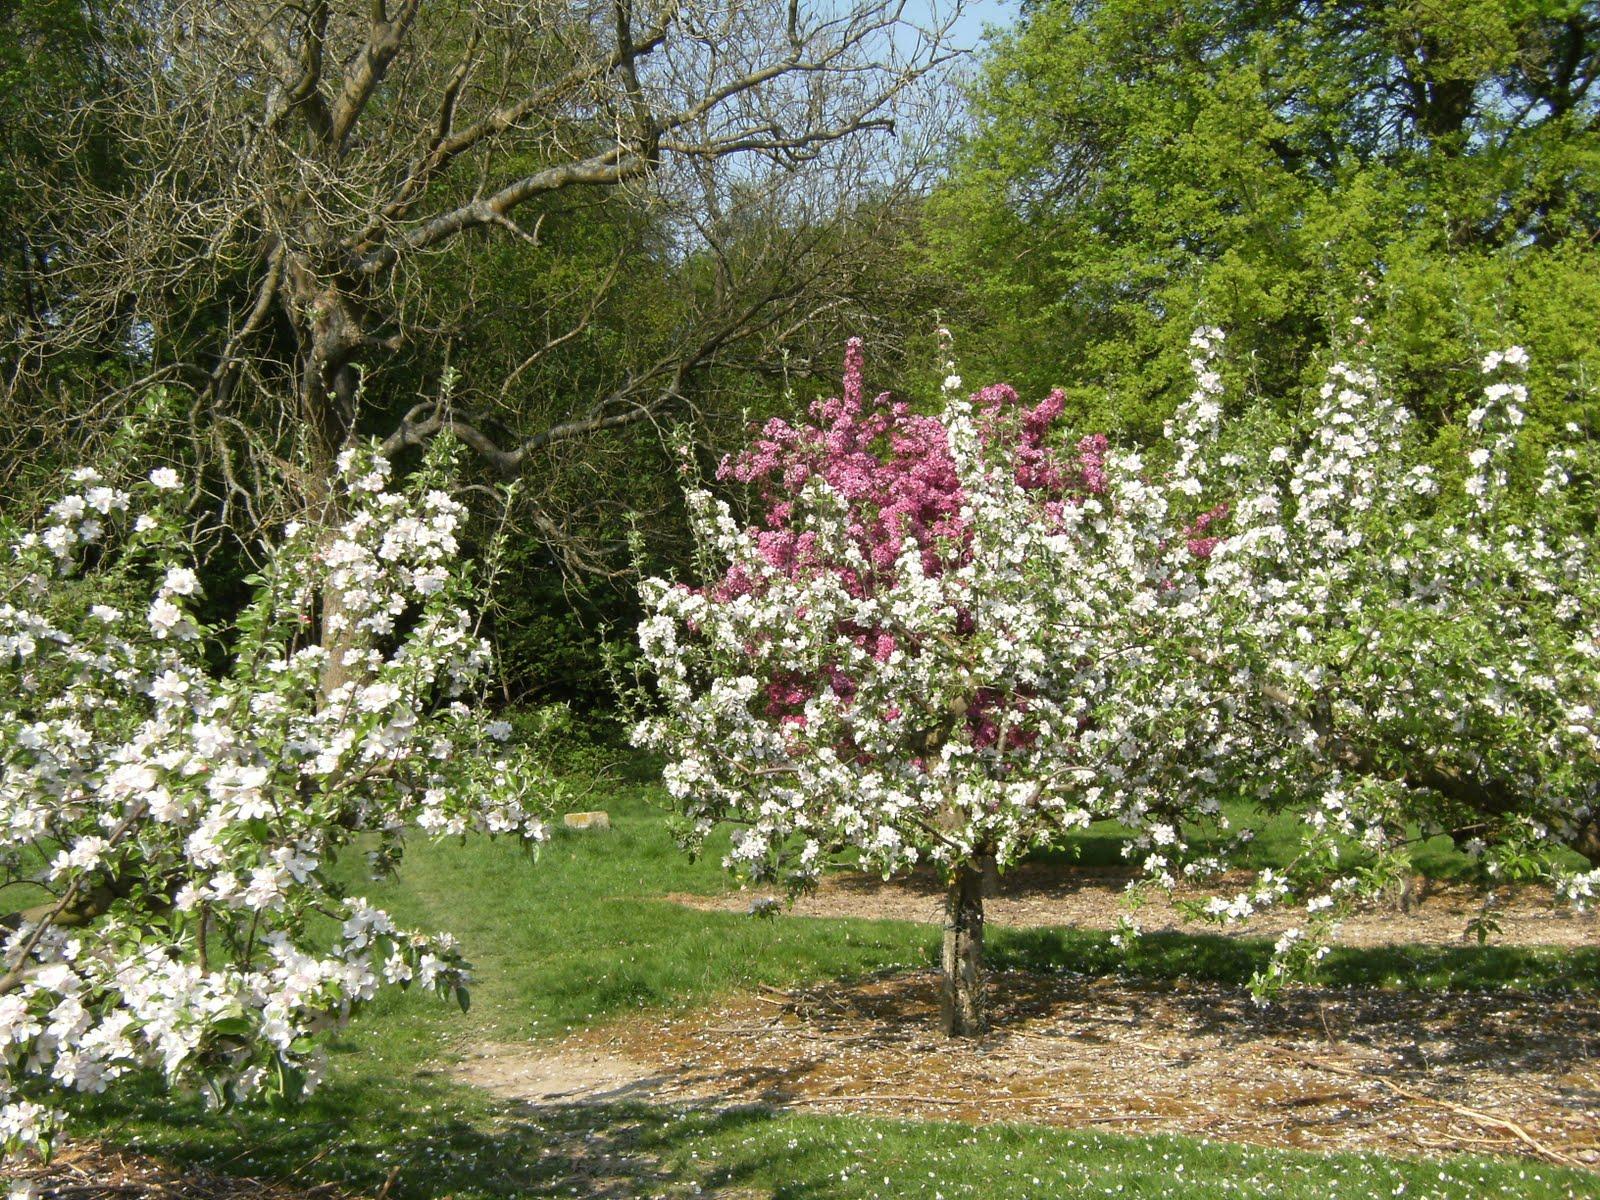 DSCF7382 Orchard at Wittersham